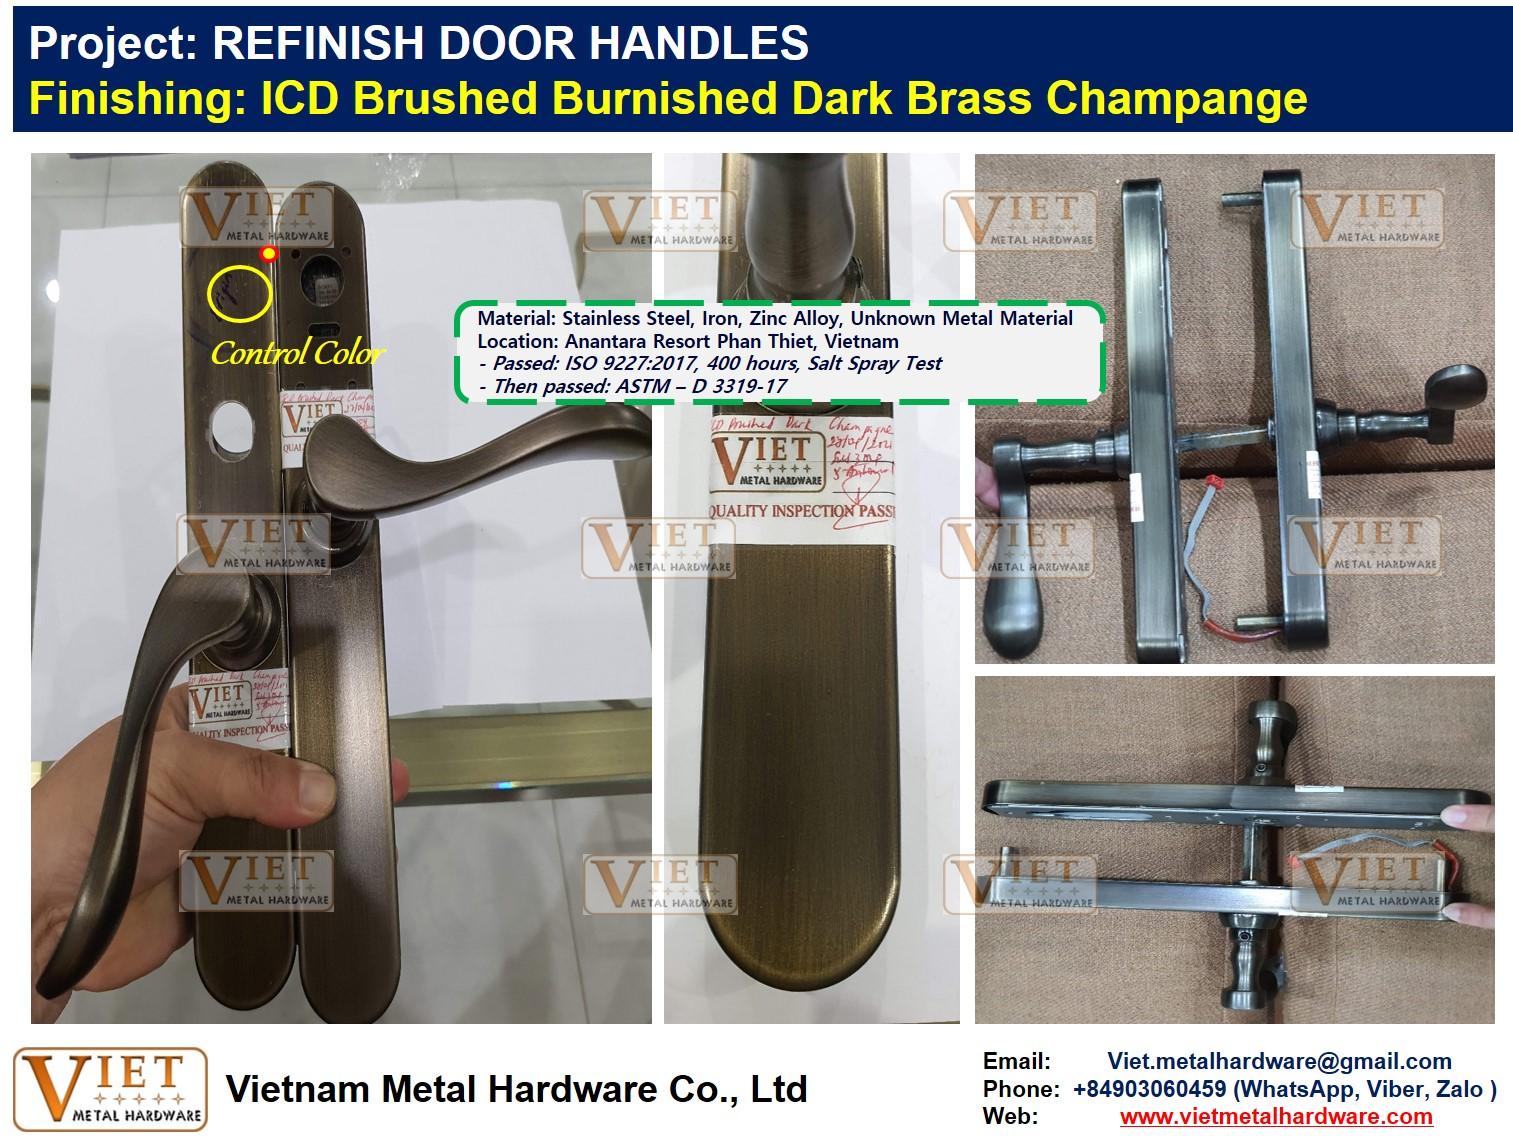 REFINISH DOOR HANDLES, ICD Brushed Burnished Dark Brass Champange